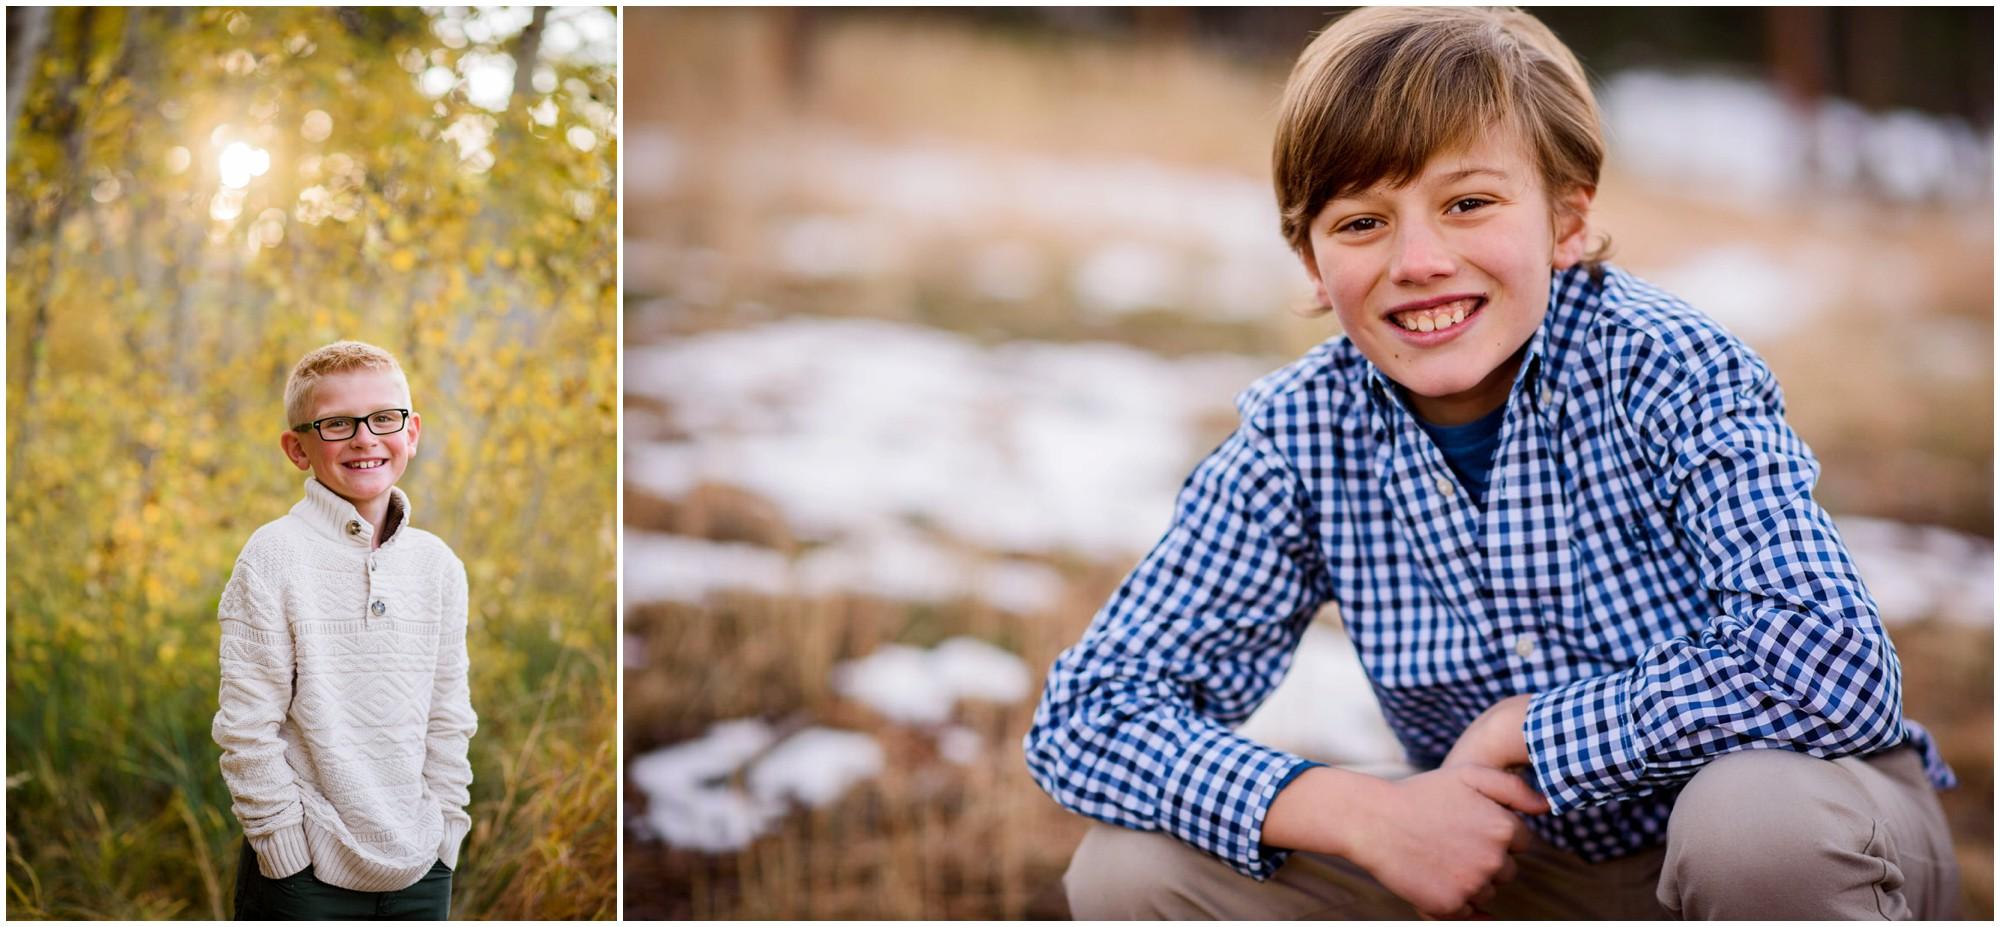 109-meyer-ranch-fall-family-photography-evans.jpg